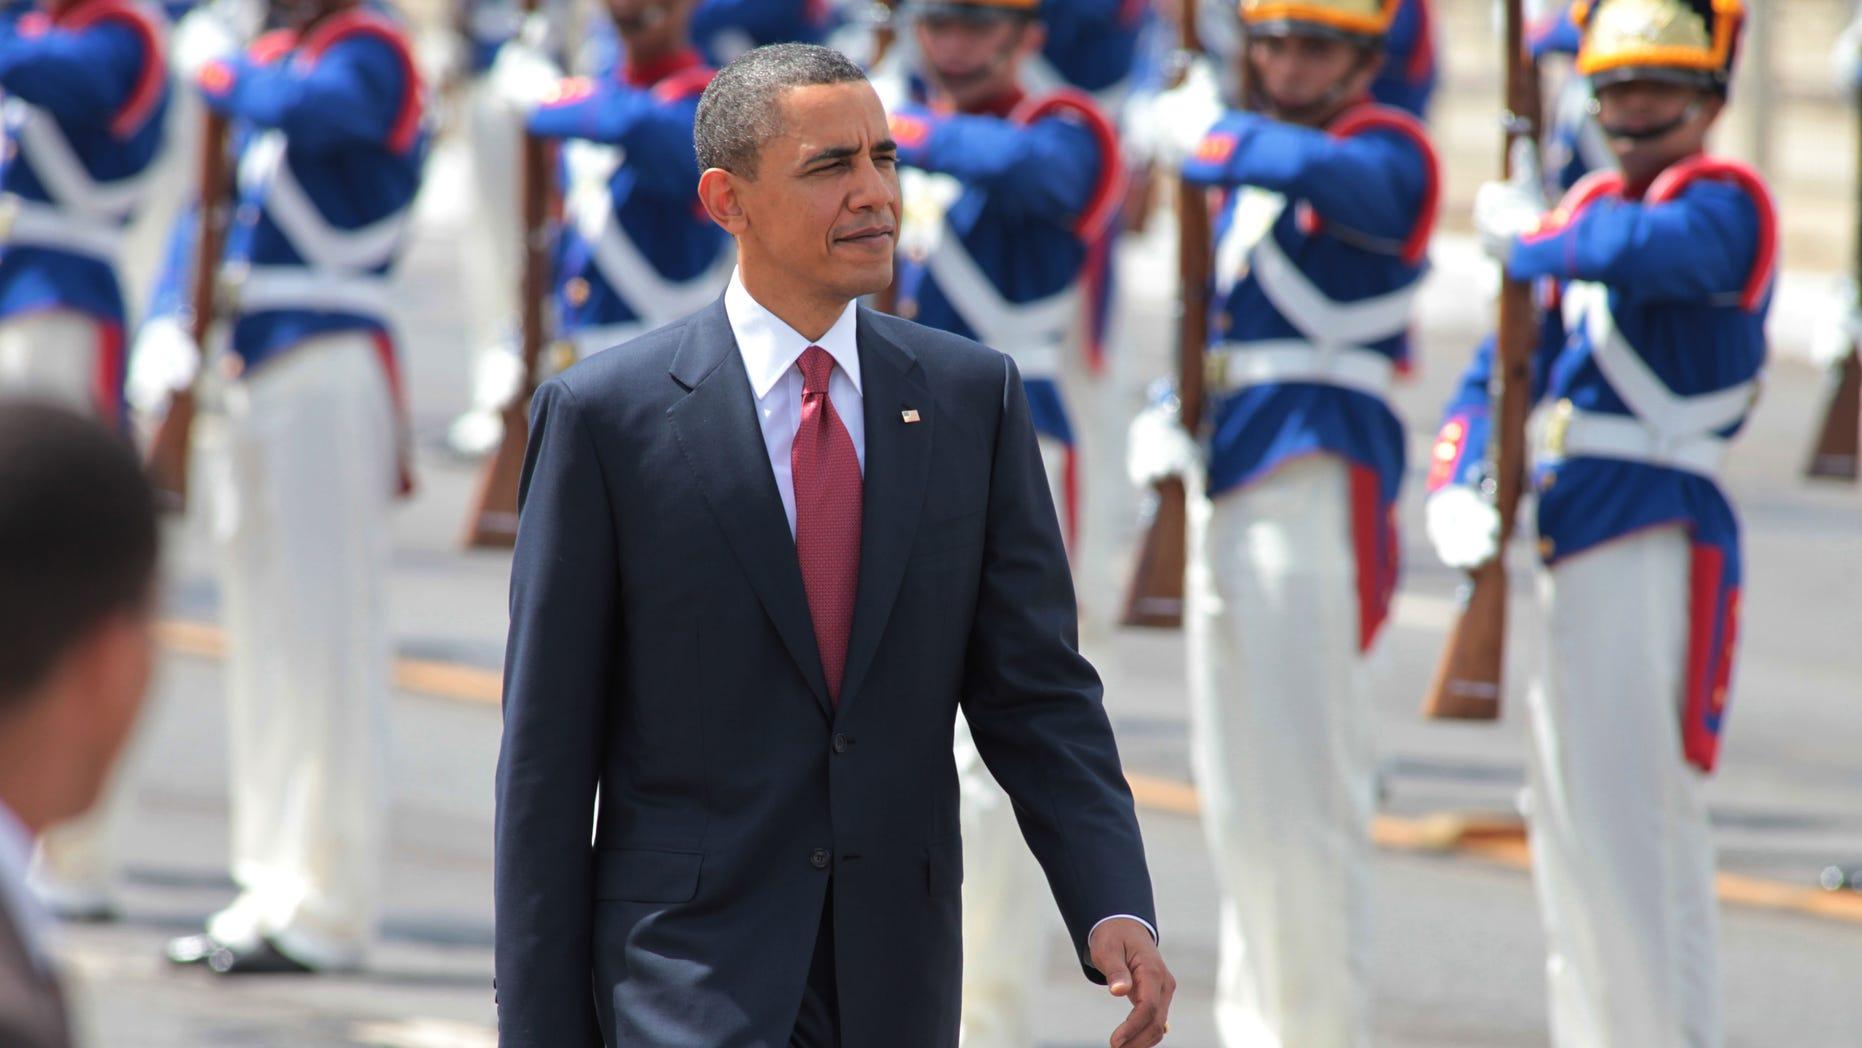 President Obama arrives to Planalto palace in Brasilia, Brazil, Saturday March 19, 2011. (AP)